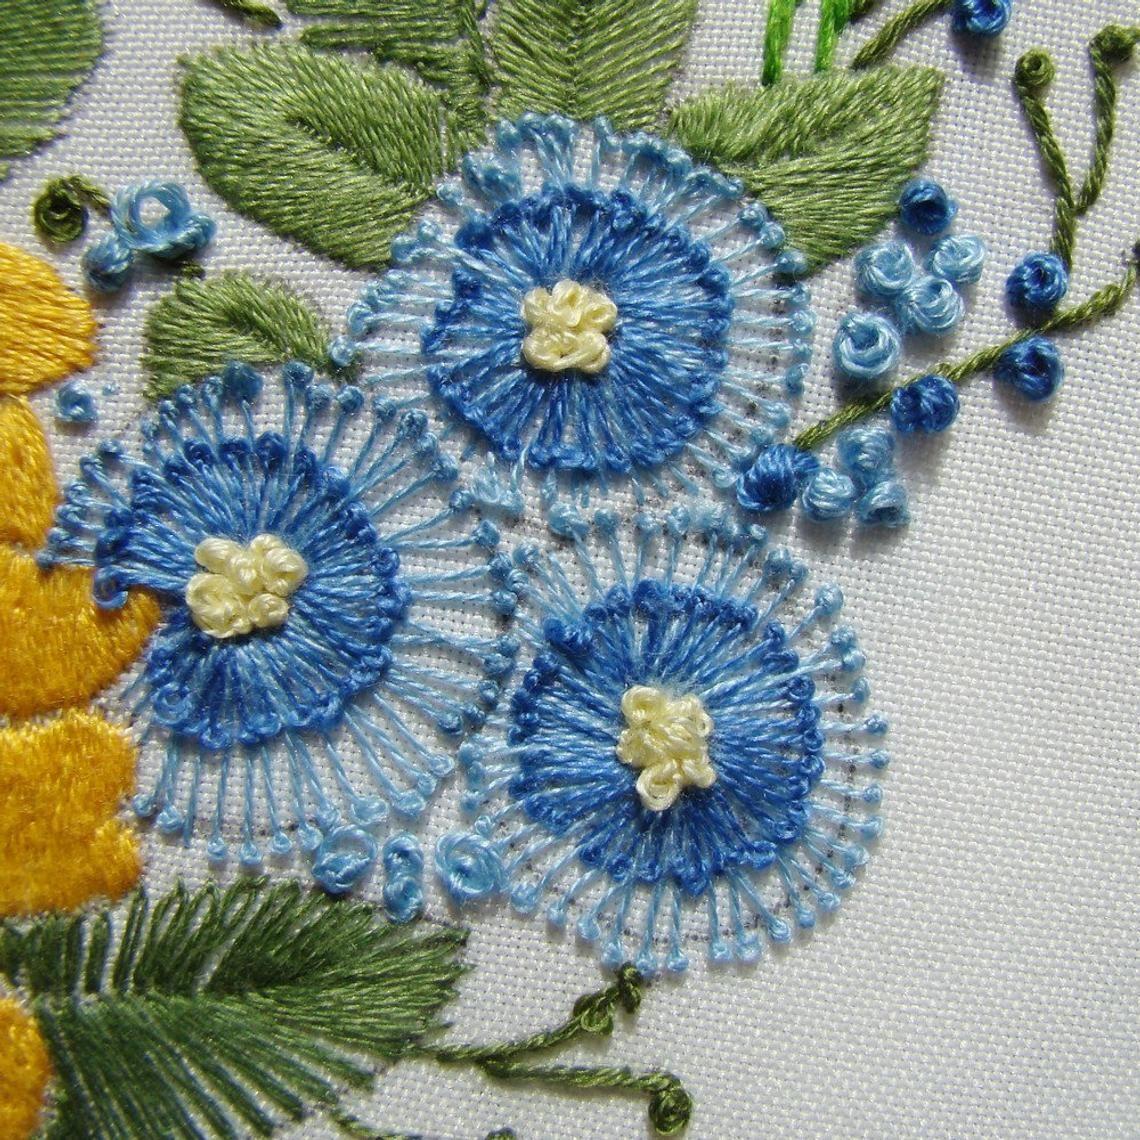 Wreath of flowers Brazilian embroidery Digital Embroidery | Etsy | Brazilian embroidery ...